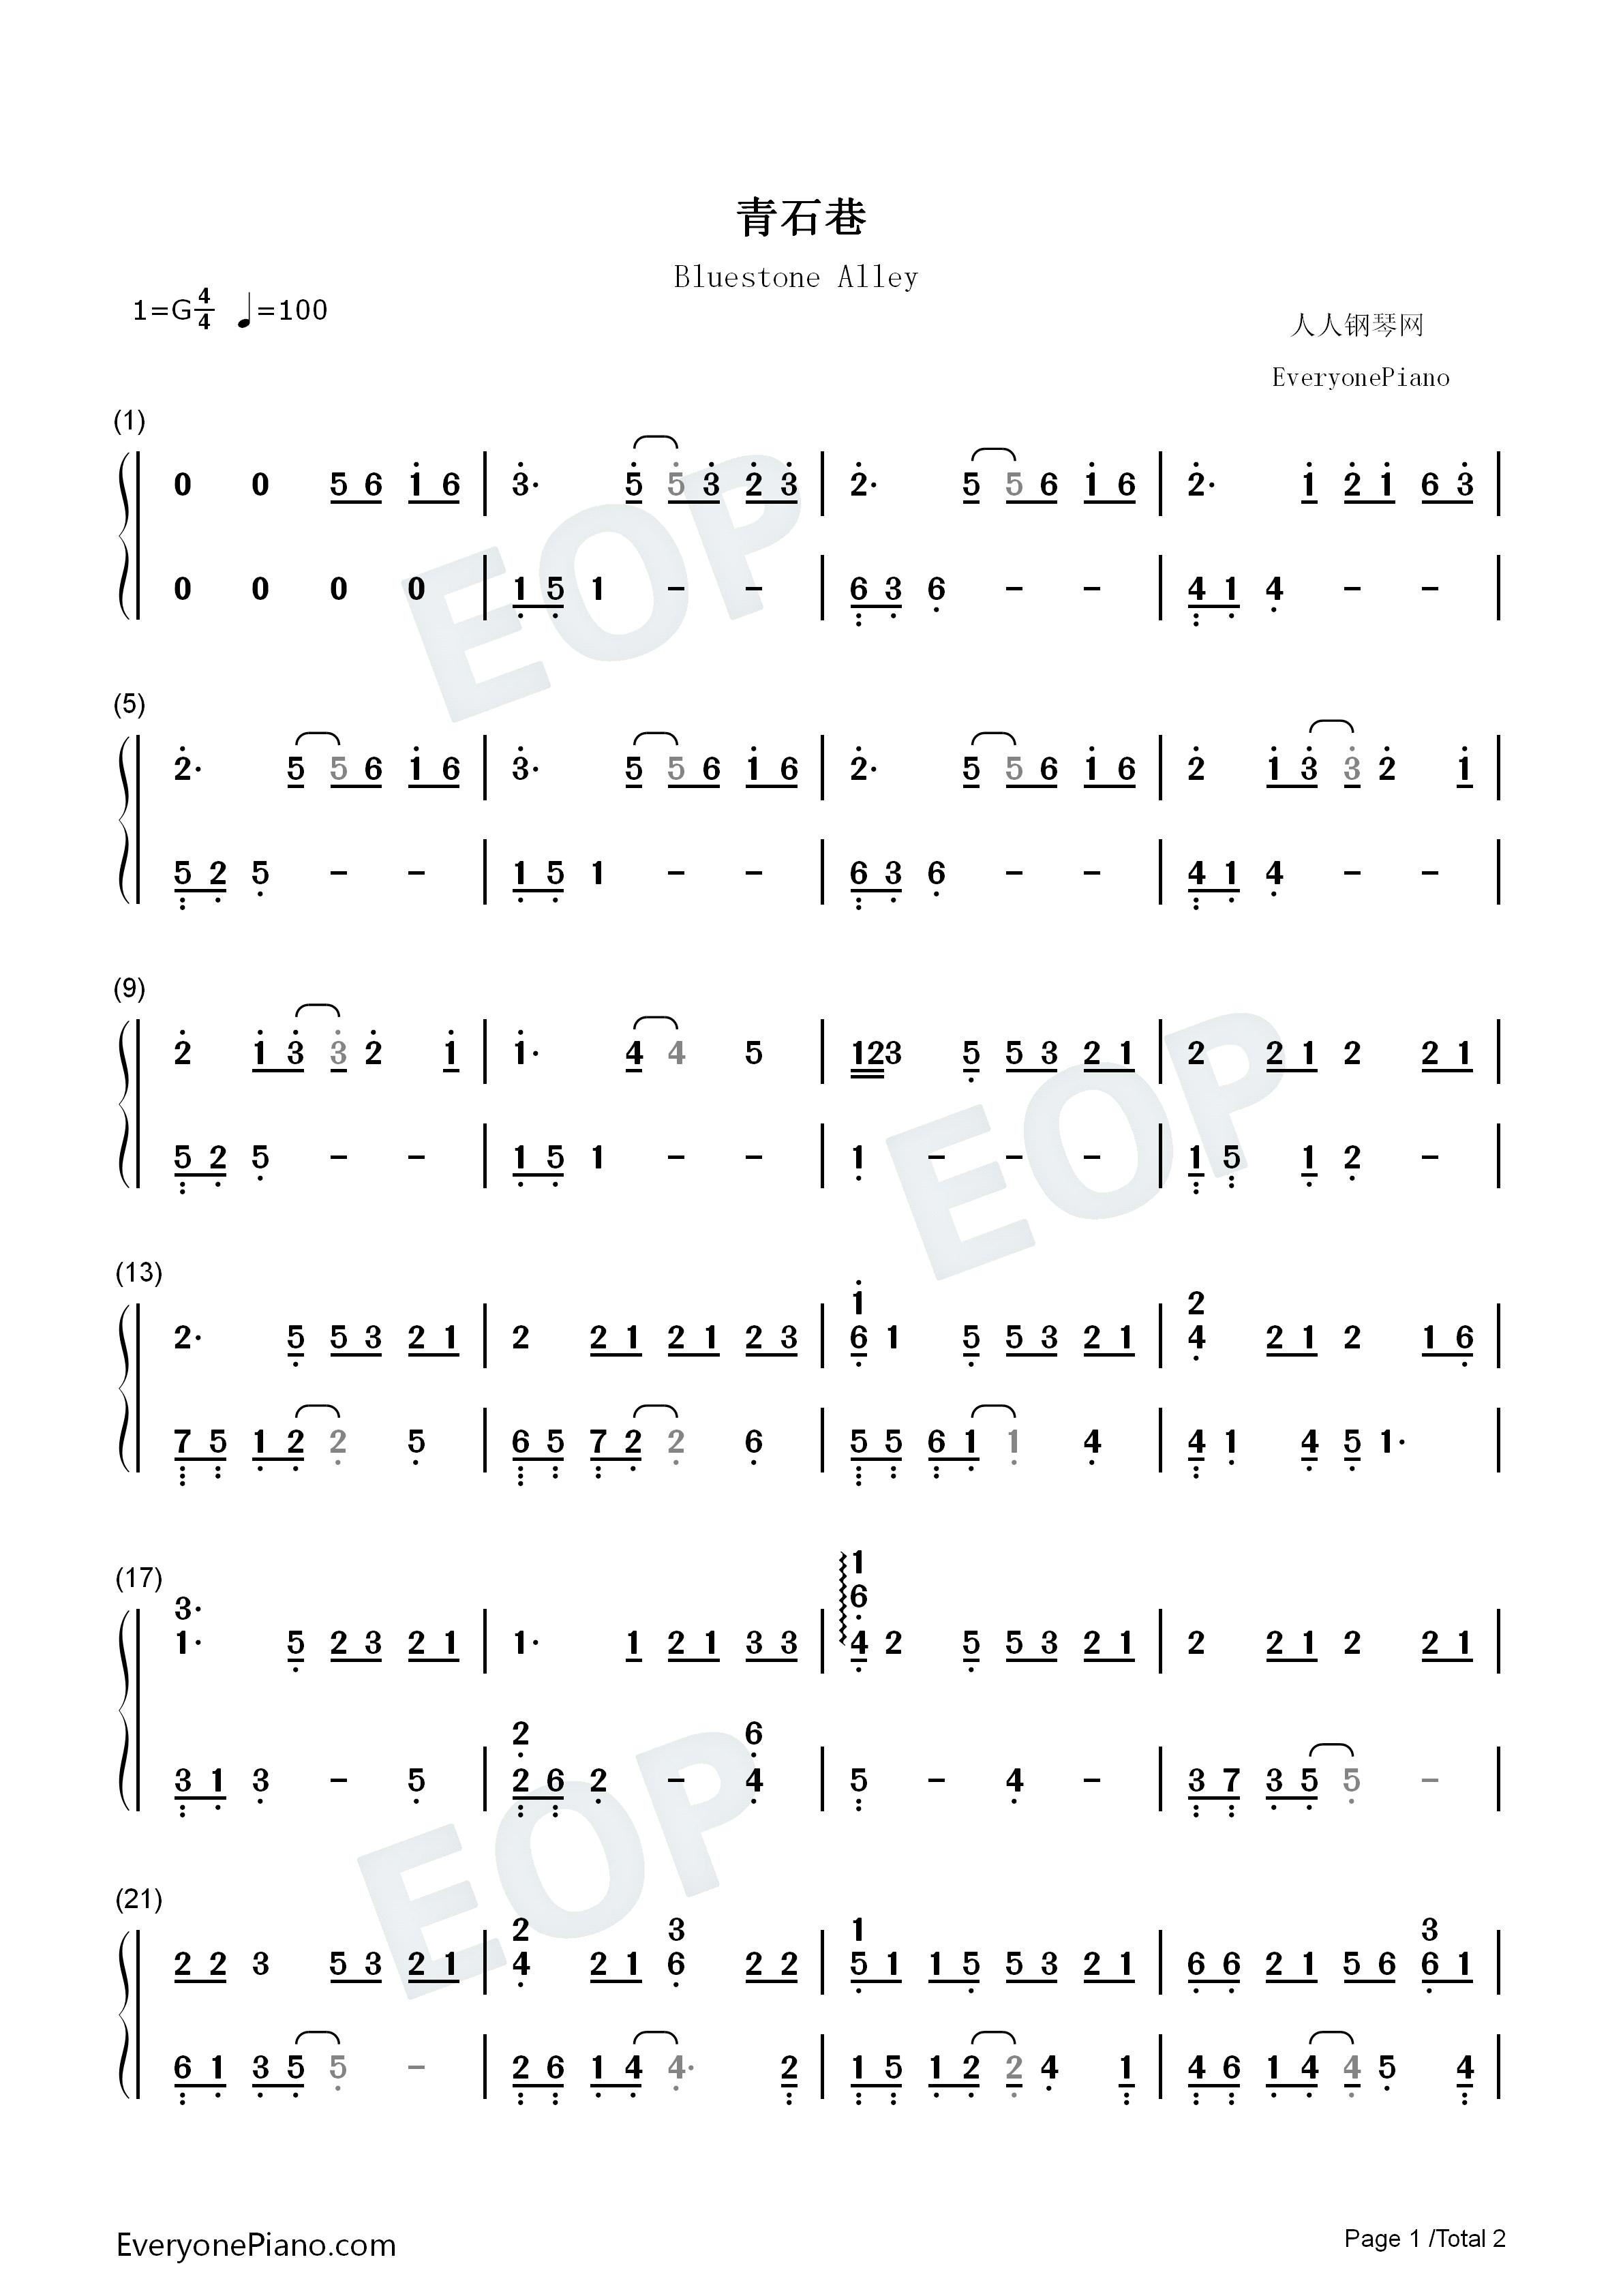 Piano Tiles 2 - Wikipedia